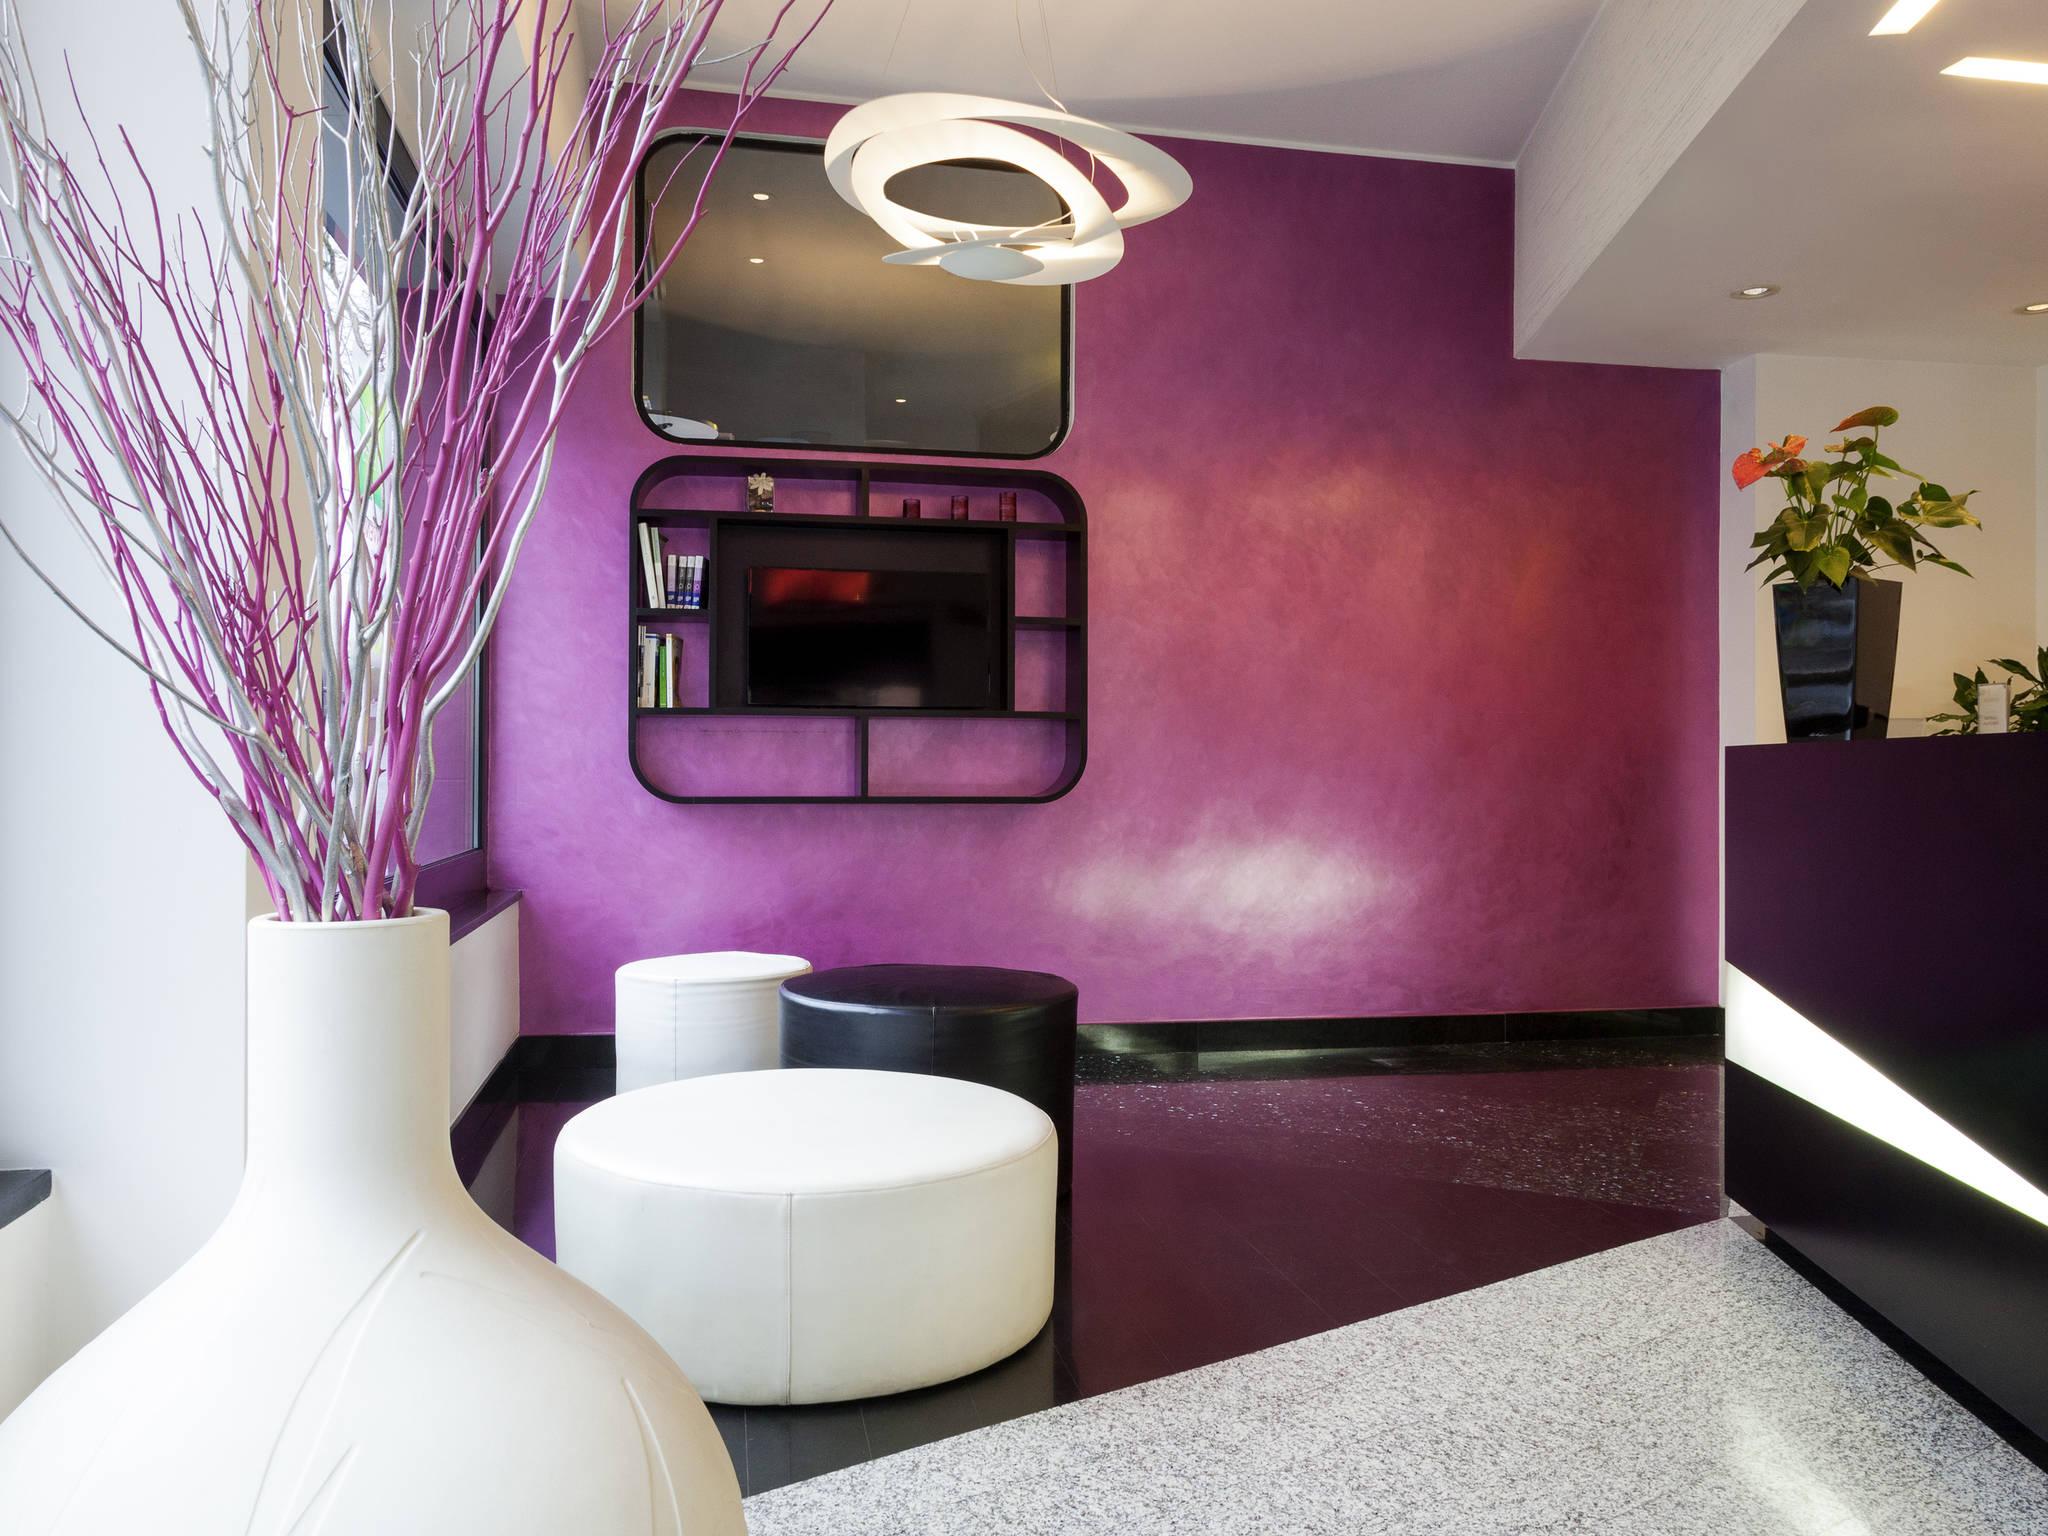 فندق - إيبيس ستايلز ibis Styles روما آرت نوبا